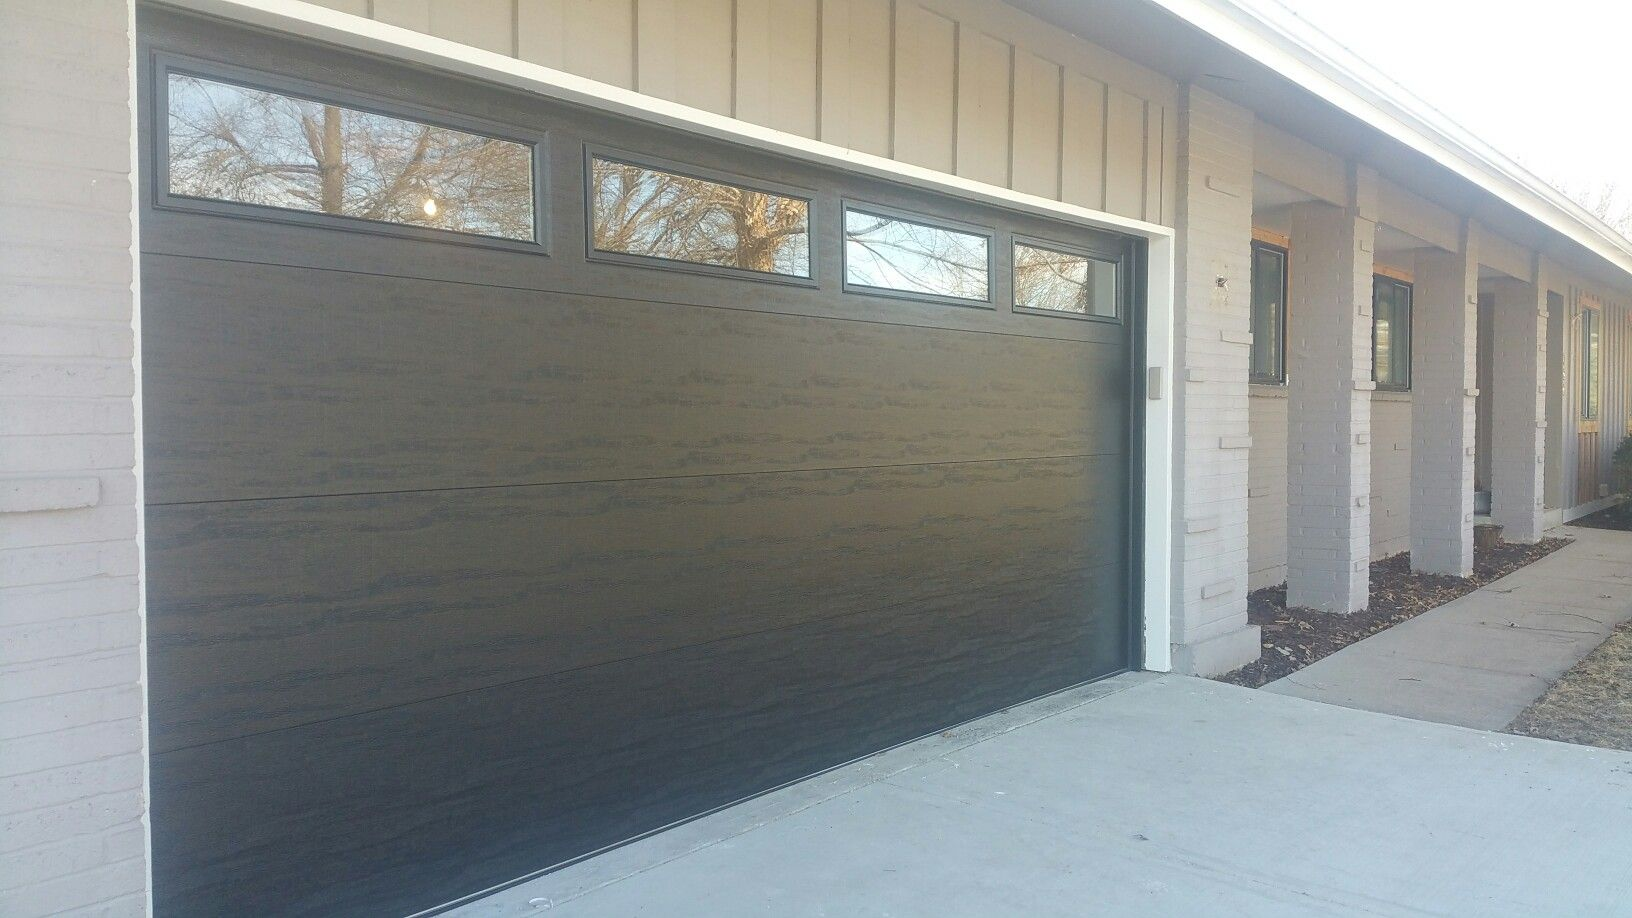 16x7 Clopay 4051 Black With Plain Lites Lake Winnebago Mo Door Installation Outdoor Decor Doors